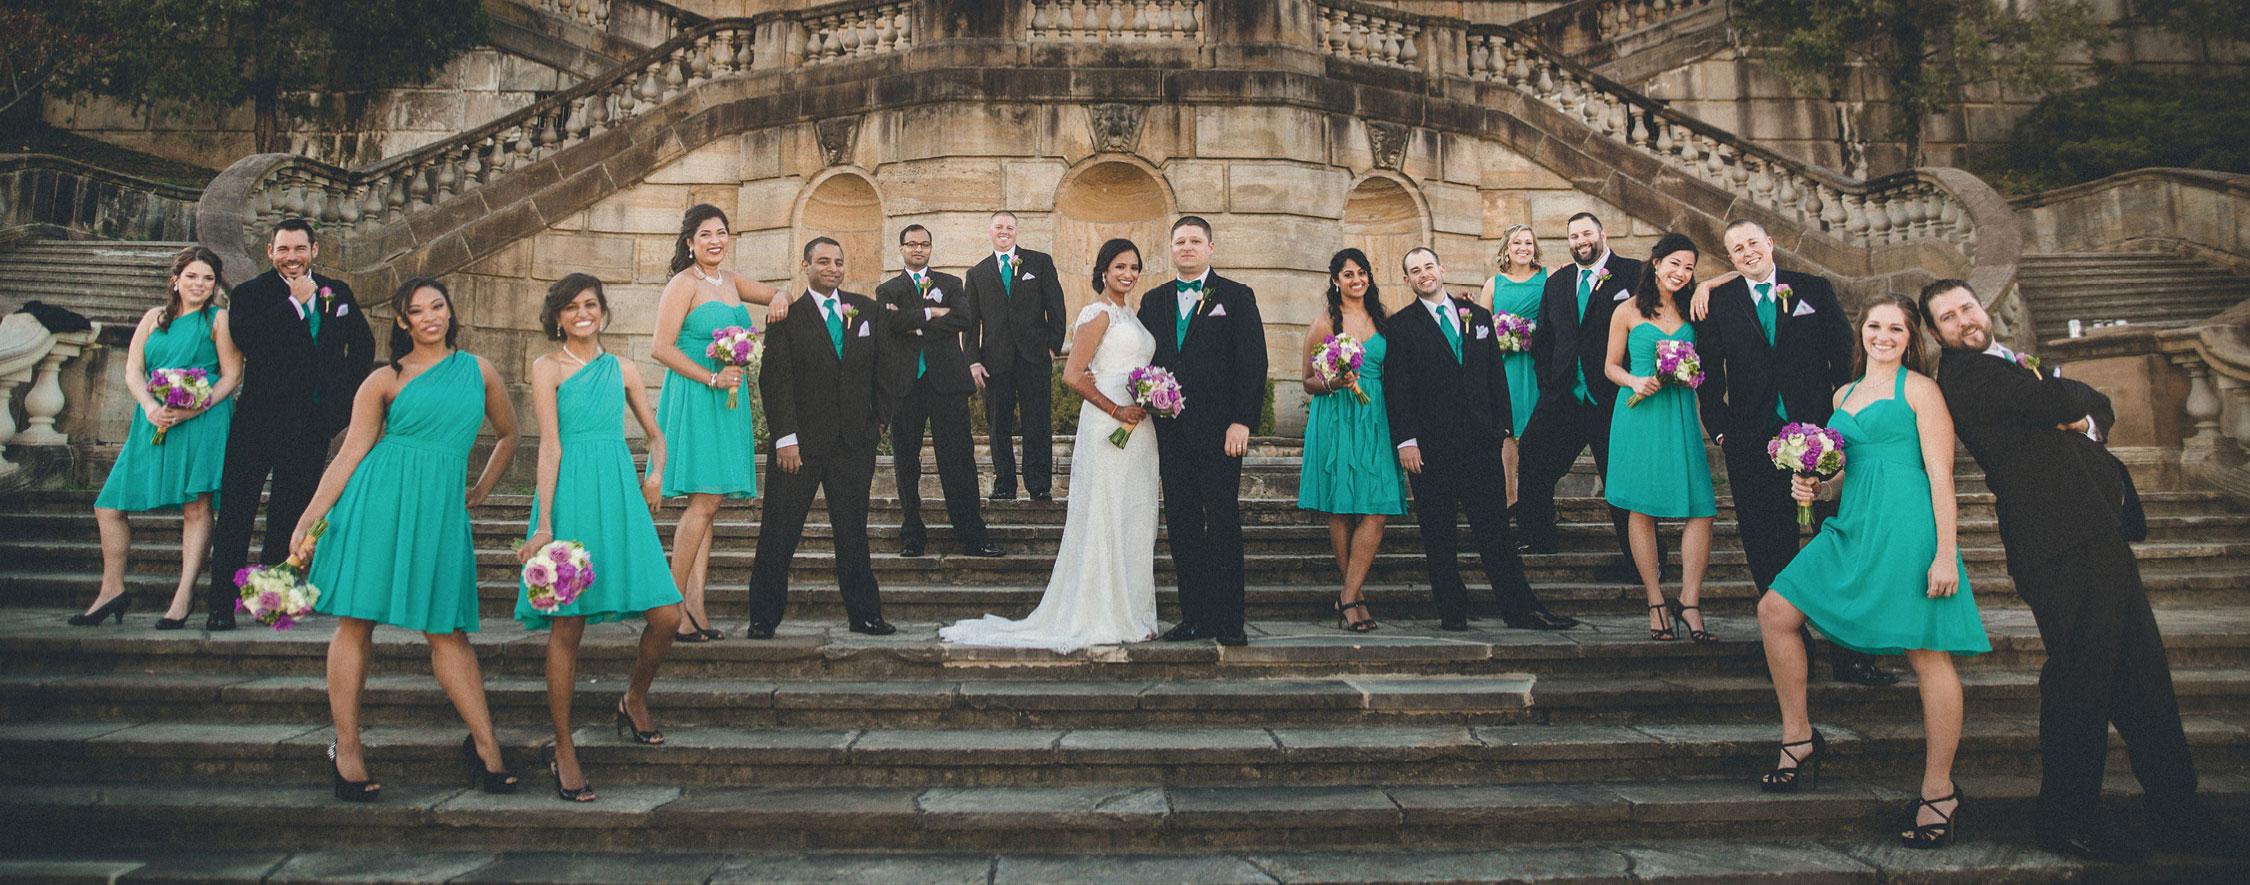 mayuri-brent-indian-wedding-photographer-dayton-ohio-25.jpg